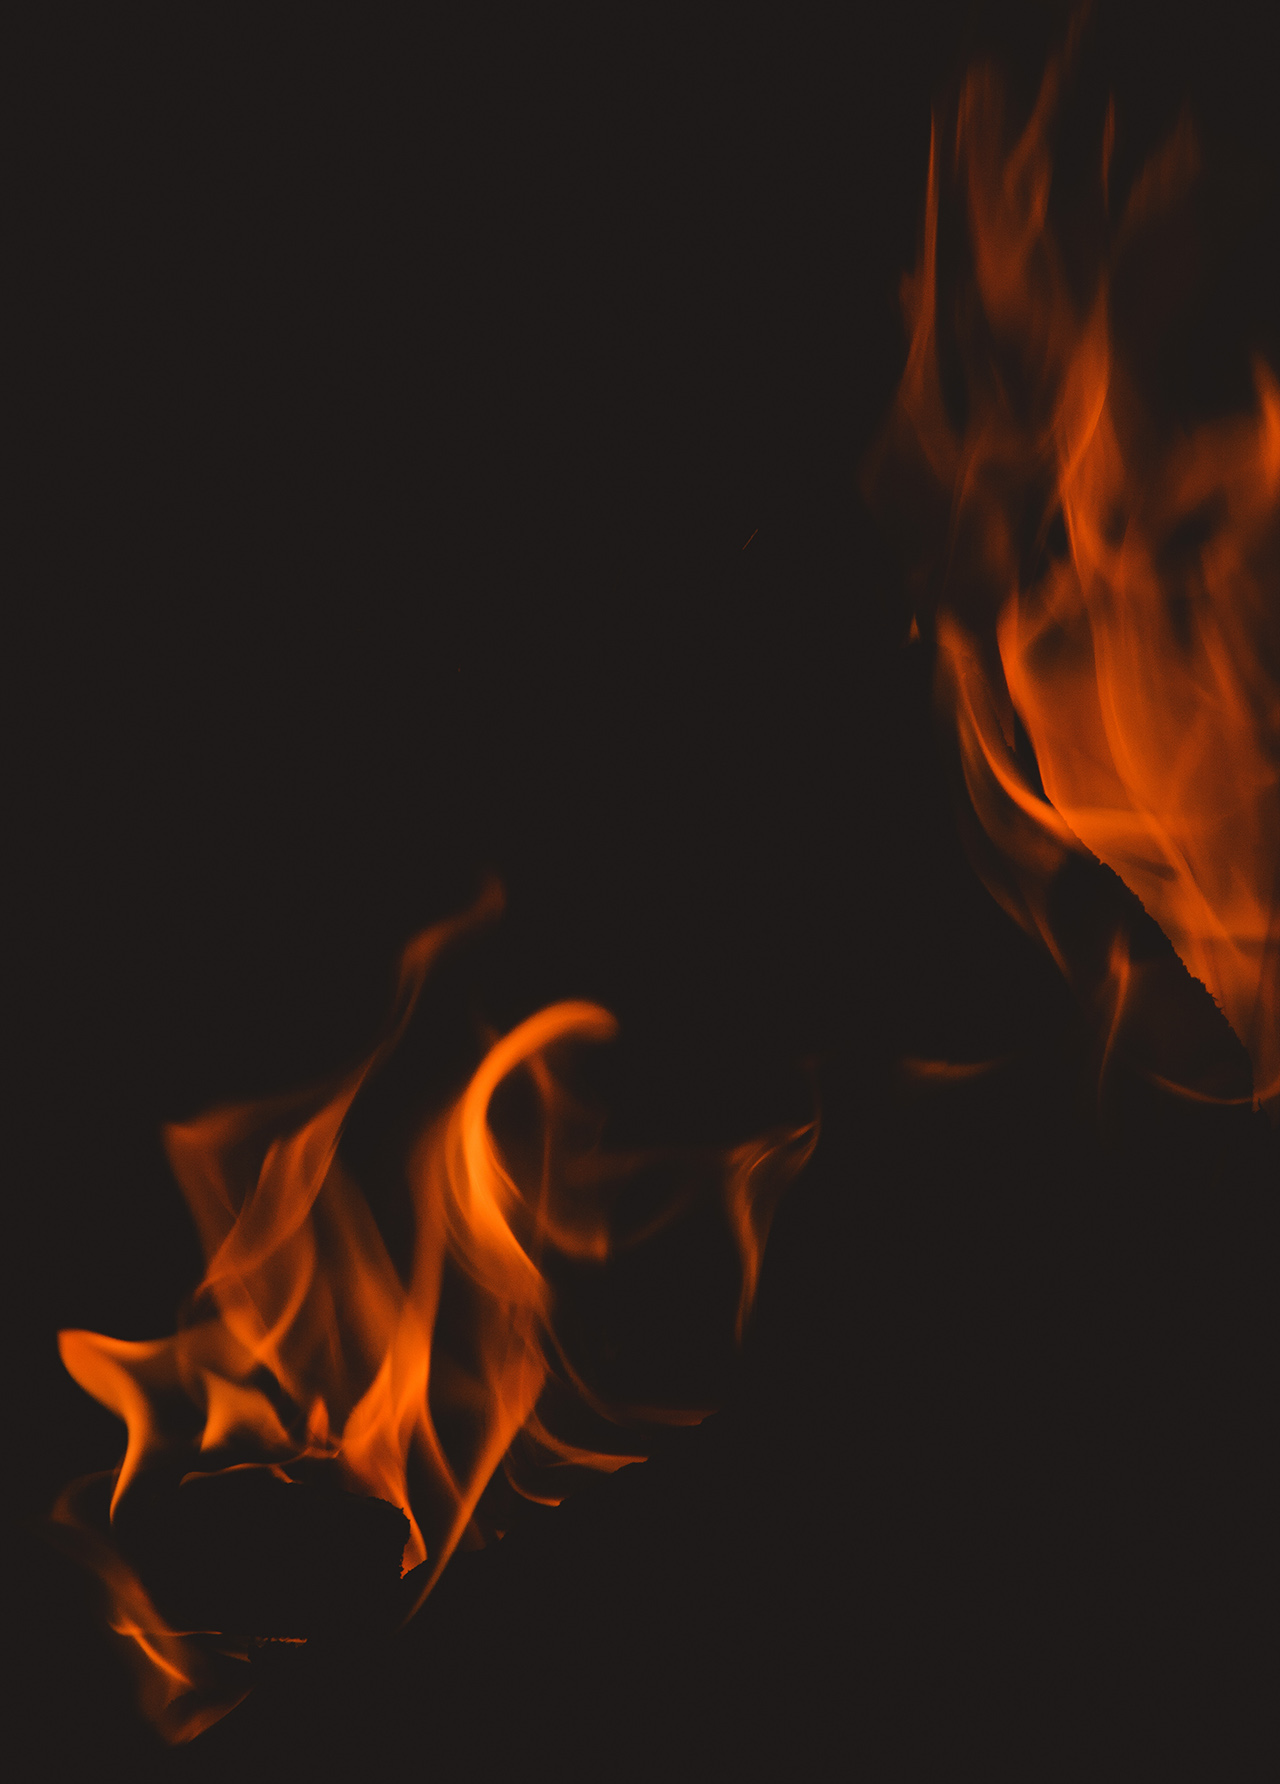 Campfire burns an orange glow